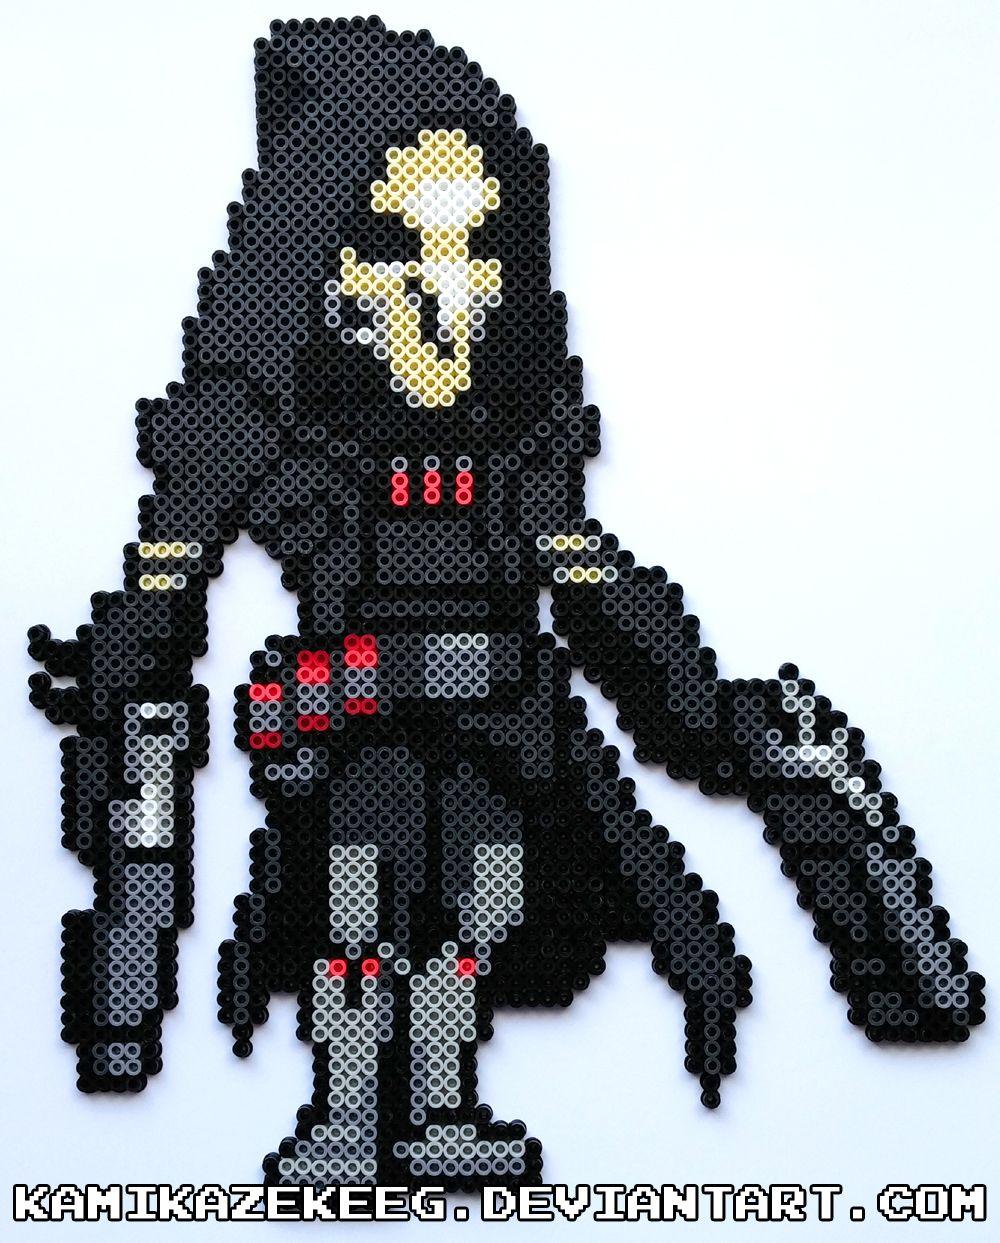 Overwatch Reaper Perler Beads by kamikazekeeg | Pixel Art